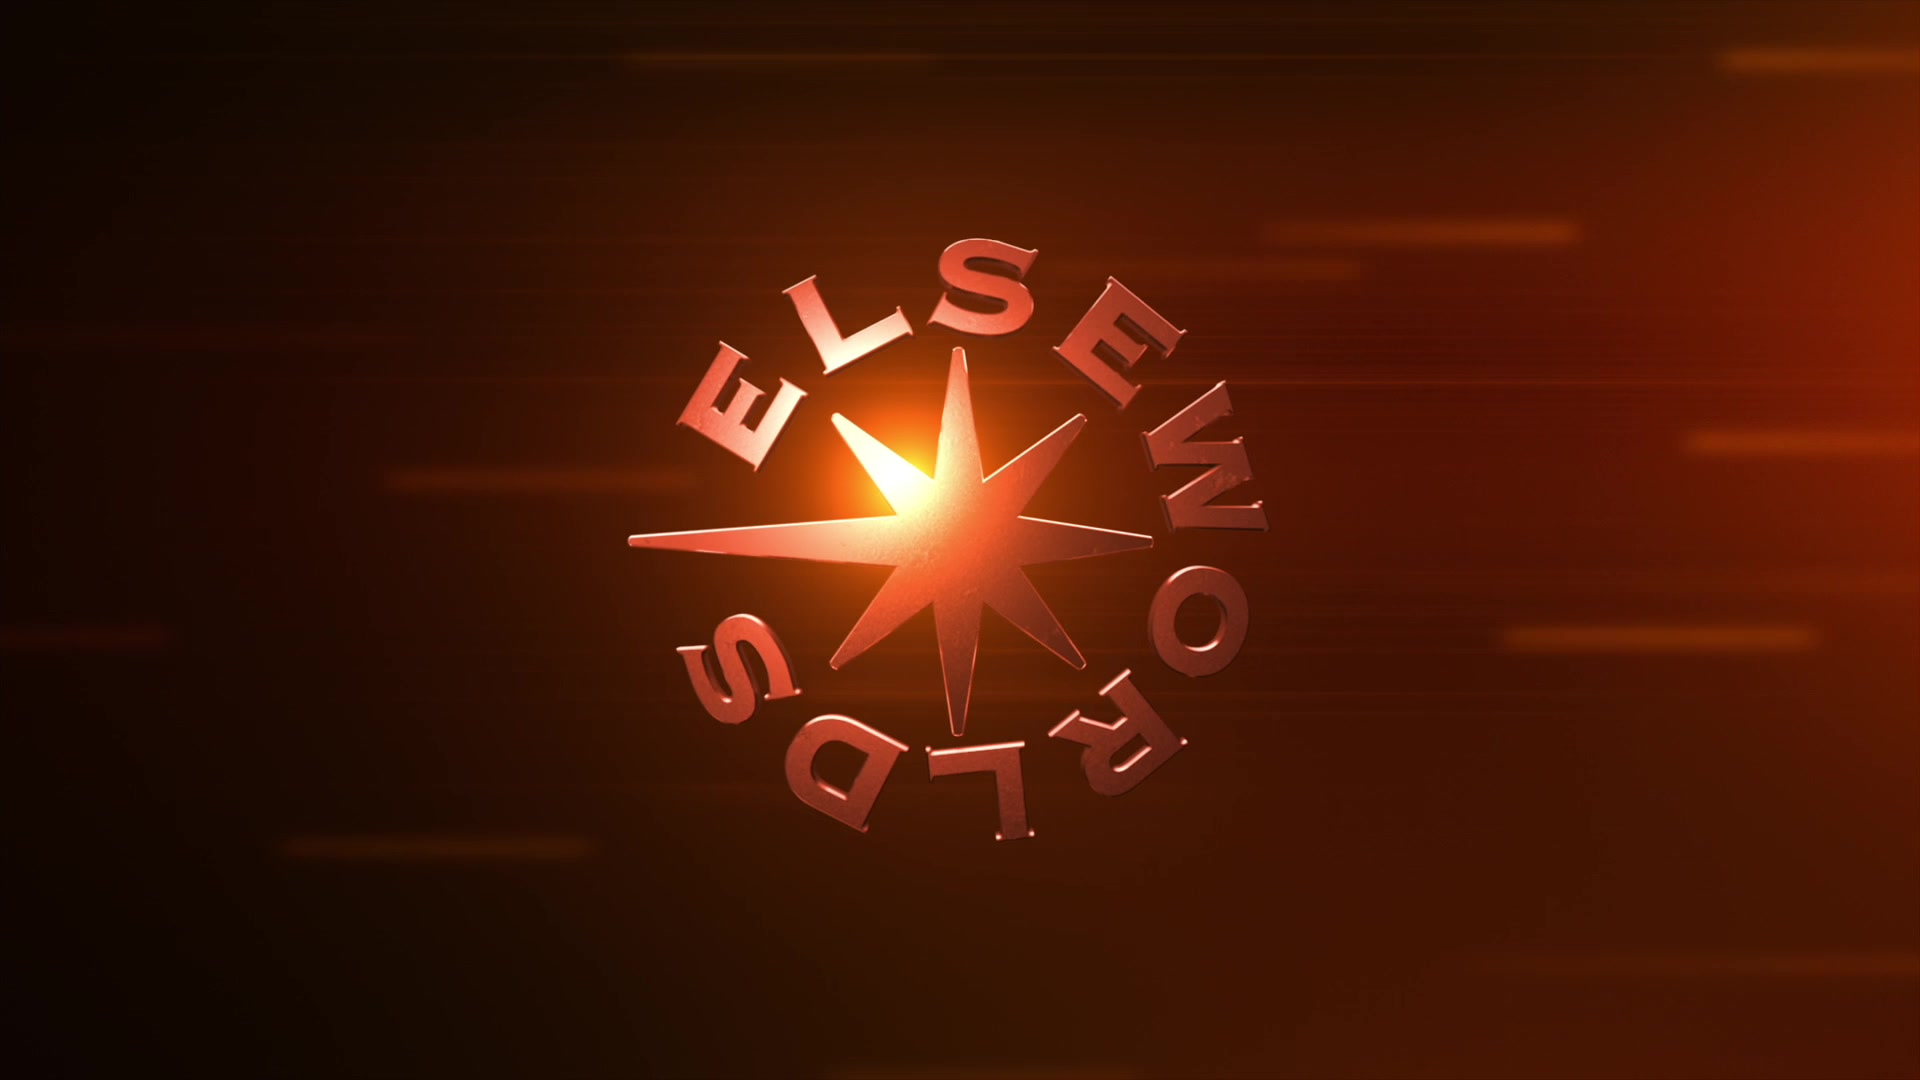 The Flash (2014 TV series) logo 008.jpg